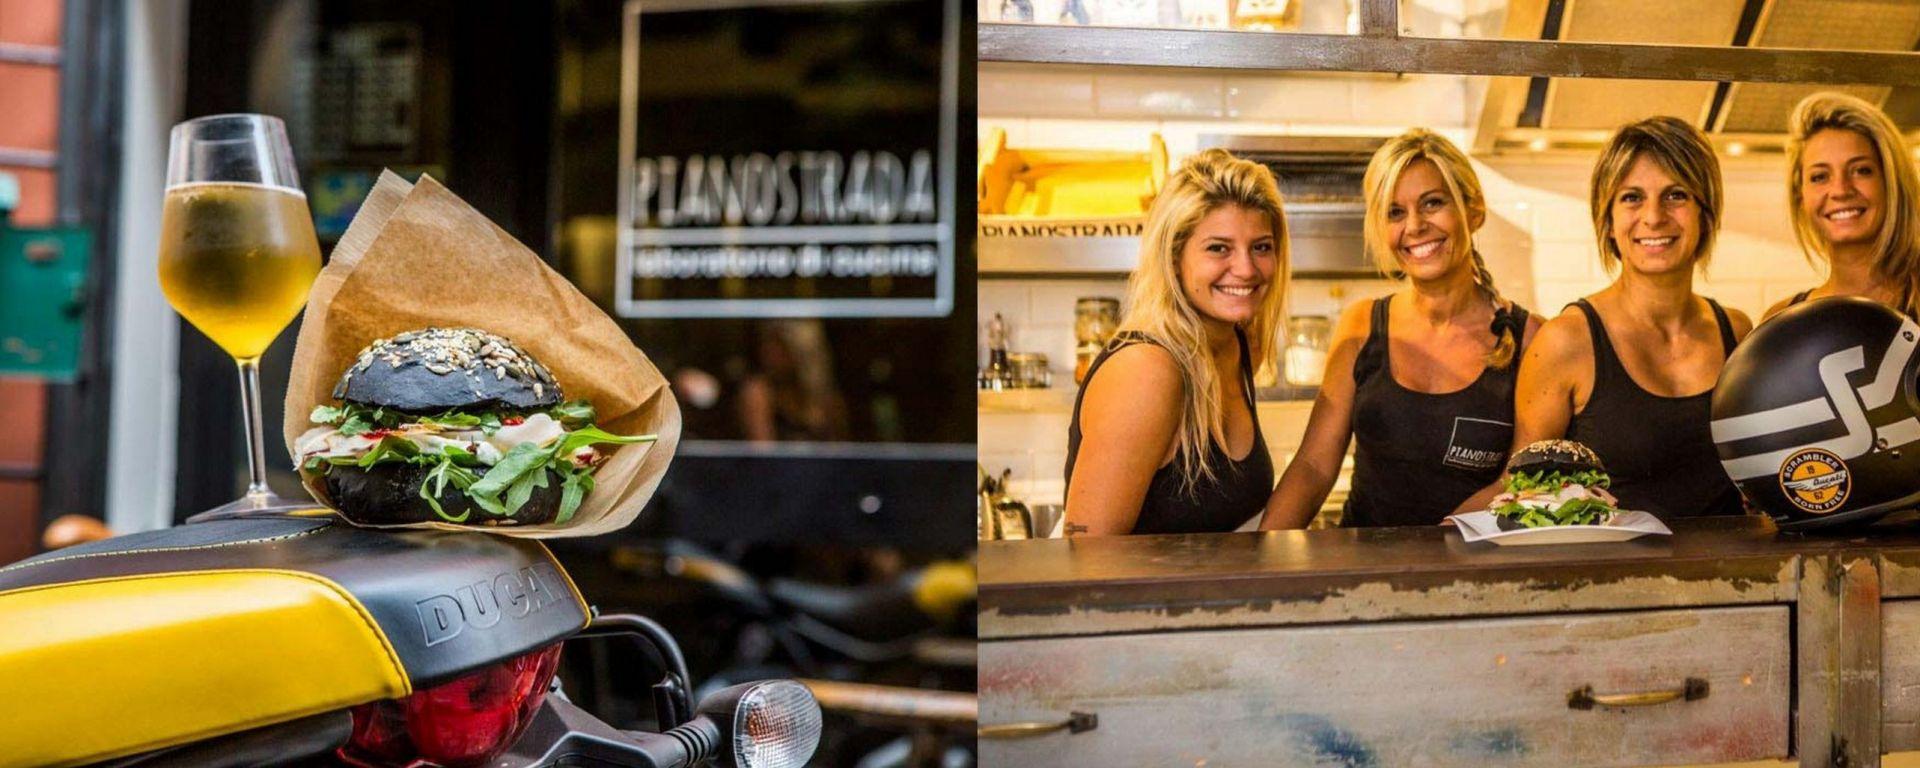 Scrambler Ducati Taste of Joy contiene oltre 150 indirizzi di street food italiani